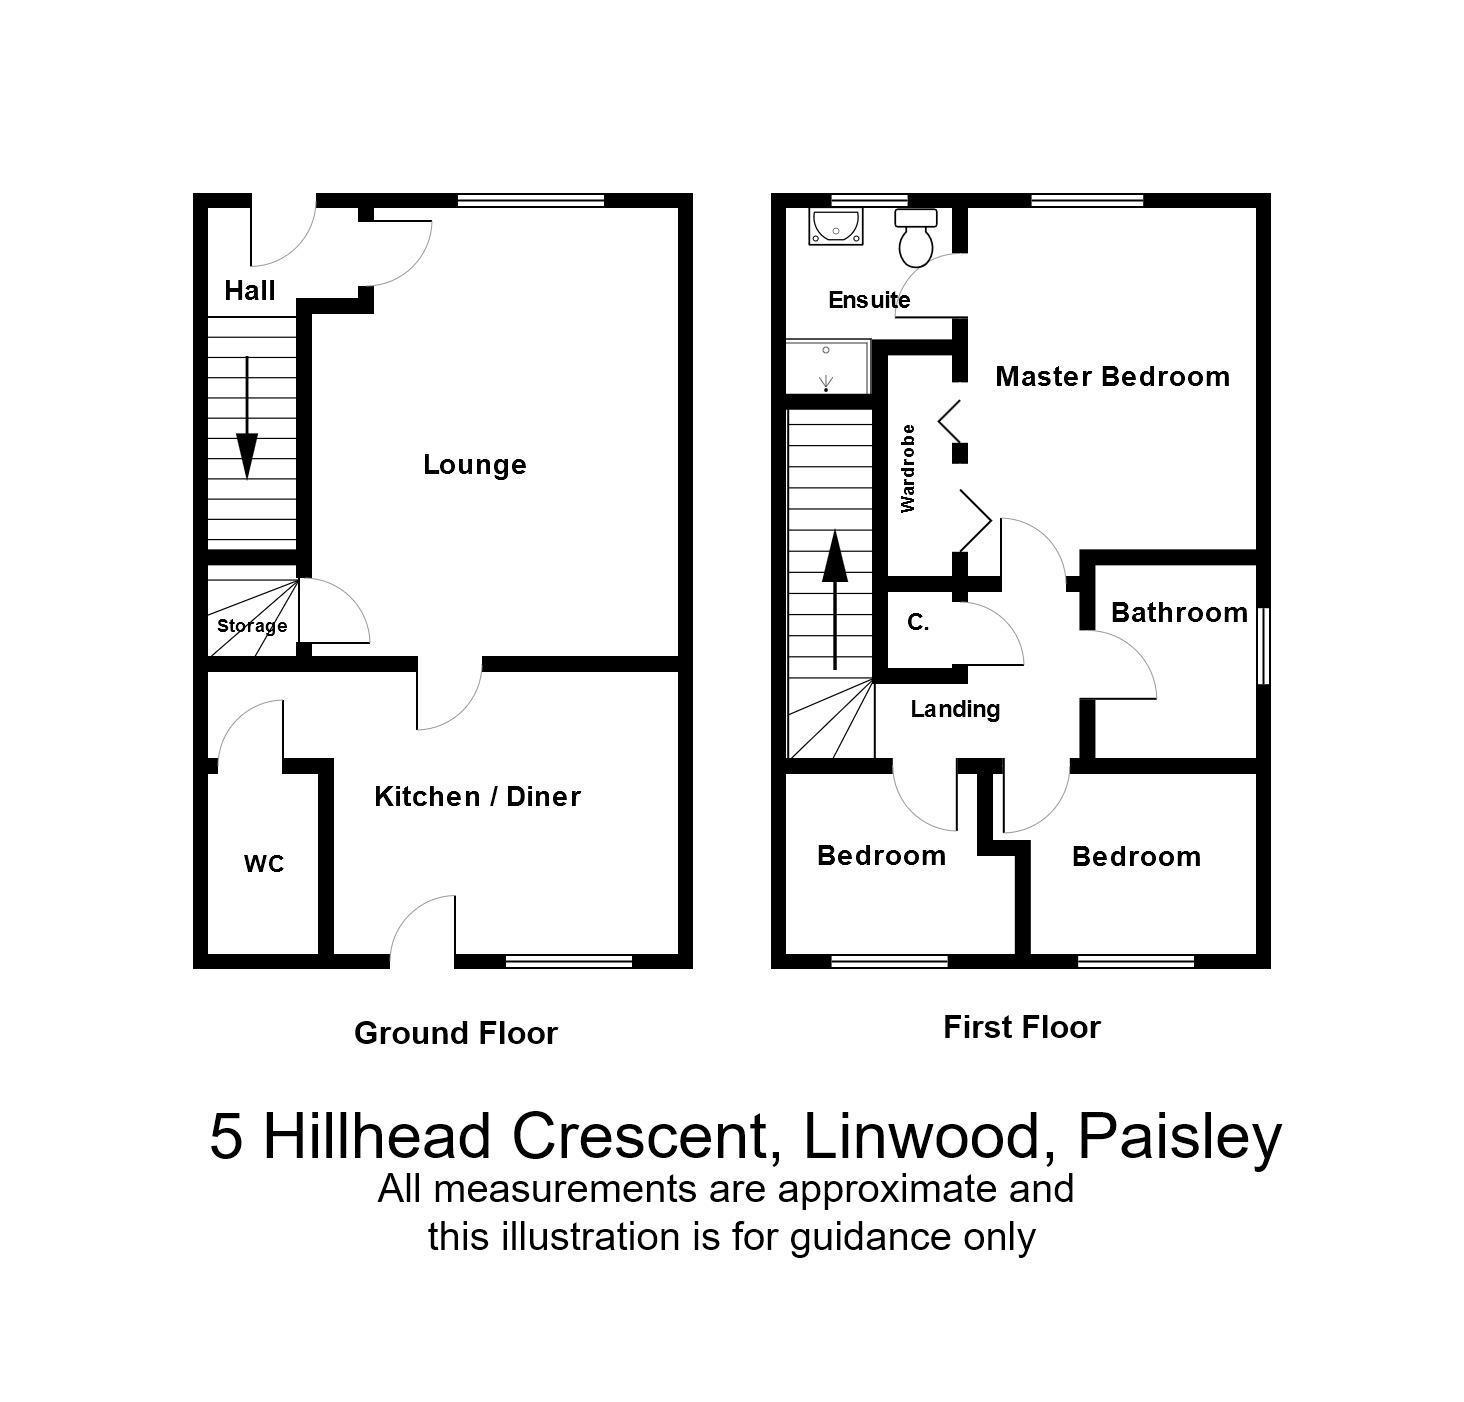 3 Bedroom House For Sale Paisley: Hillhead Crescent, Linwood, Paisley PA3, 3 Bedroom Semi